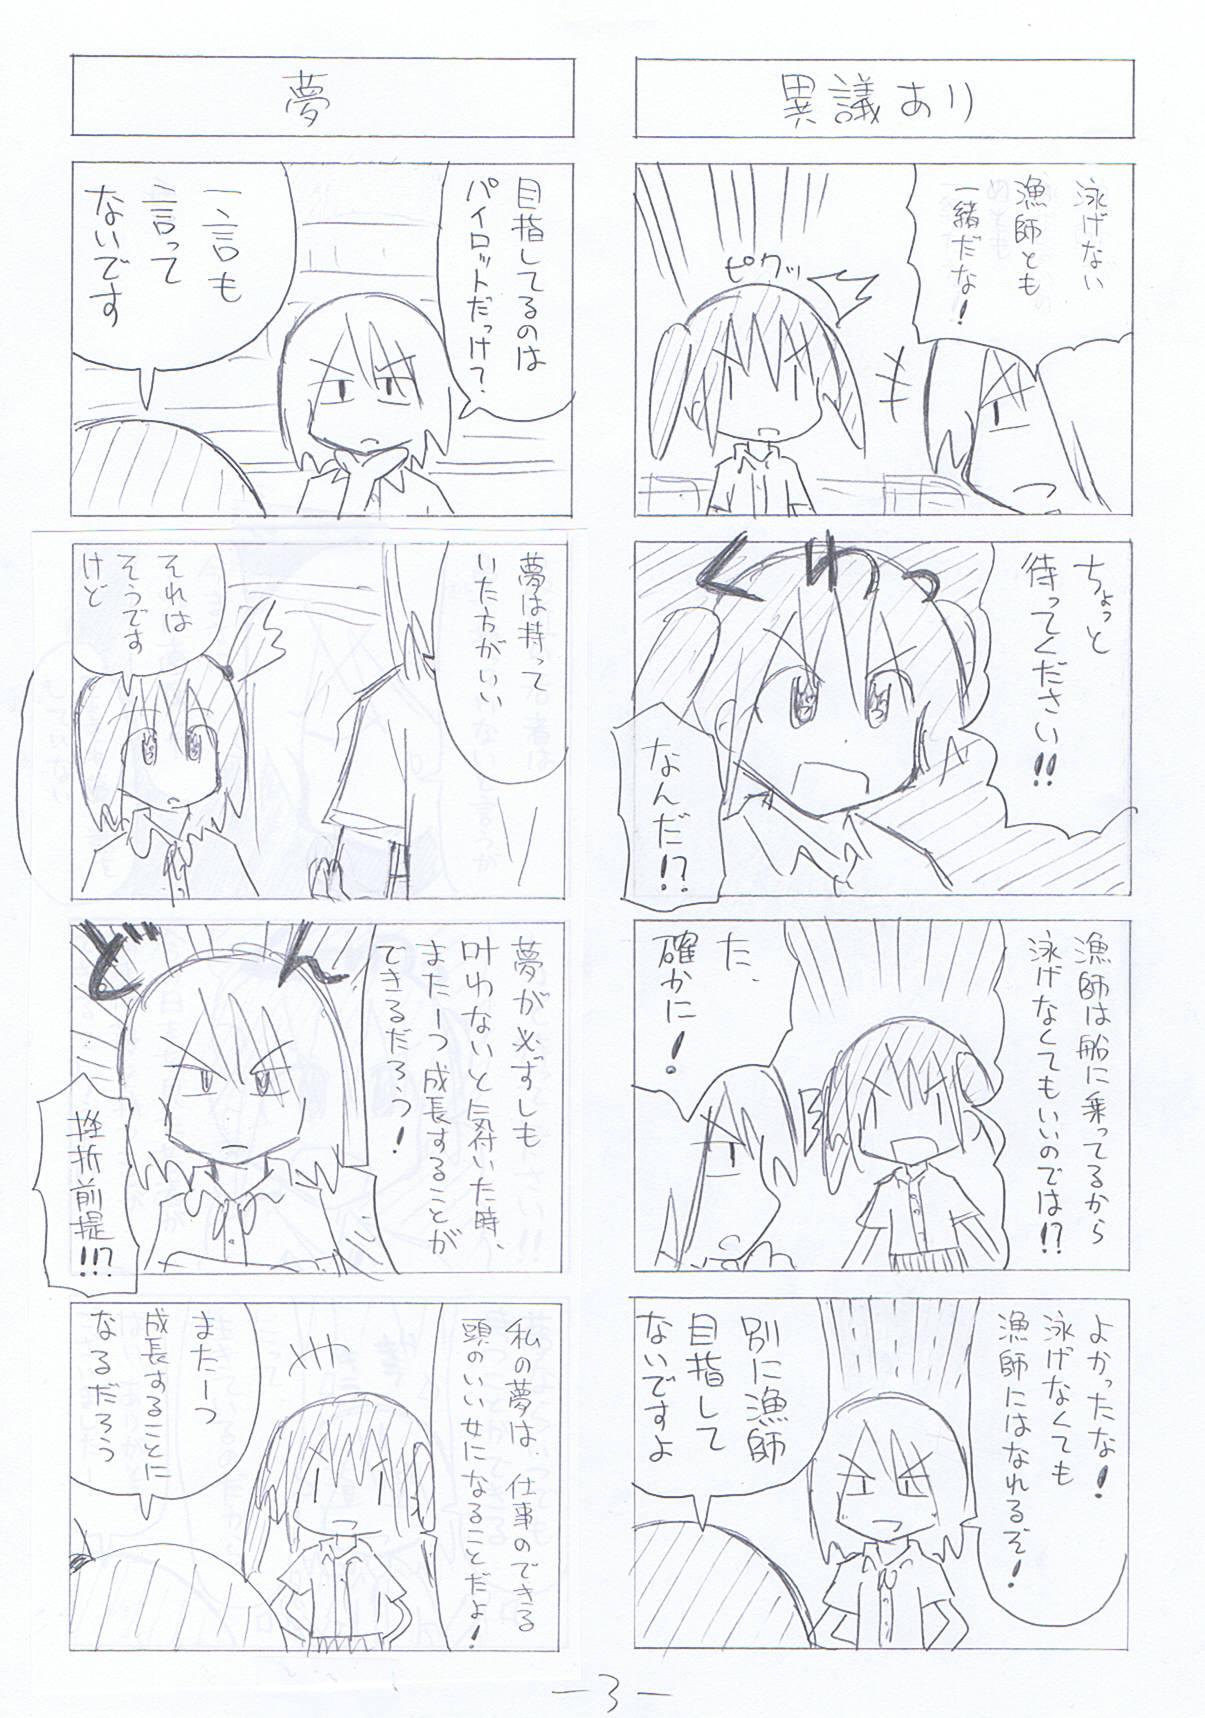 hitotoki-3-3.jpg